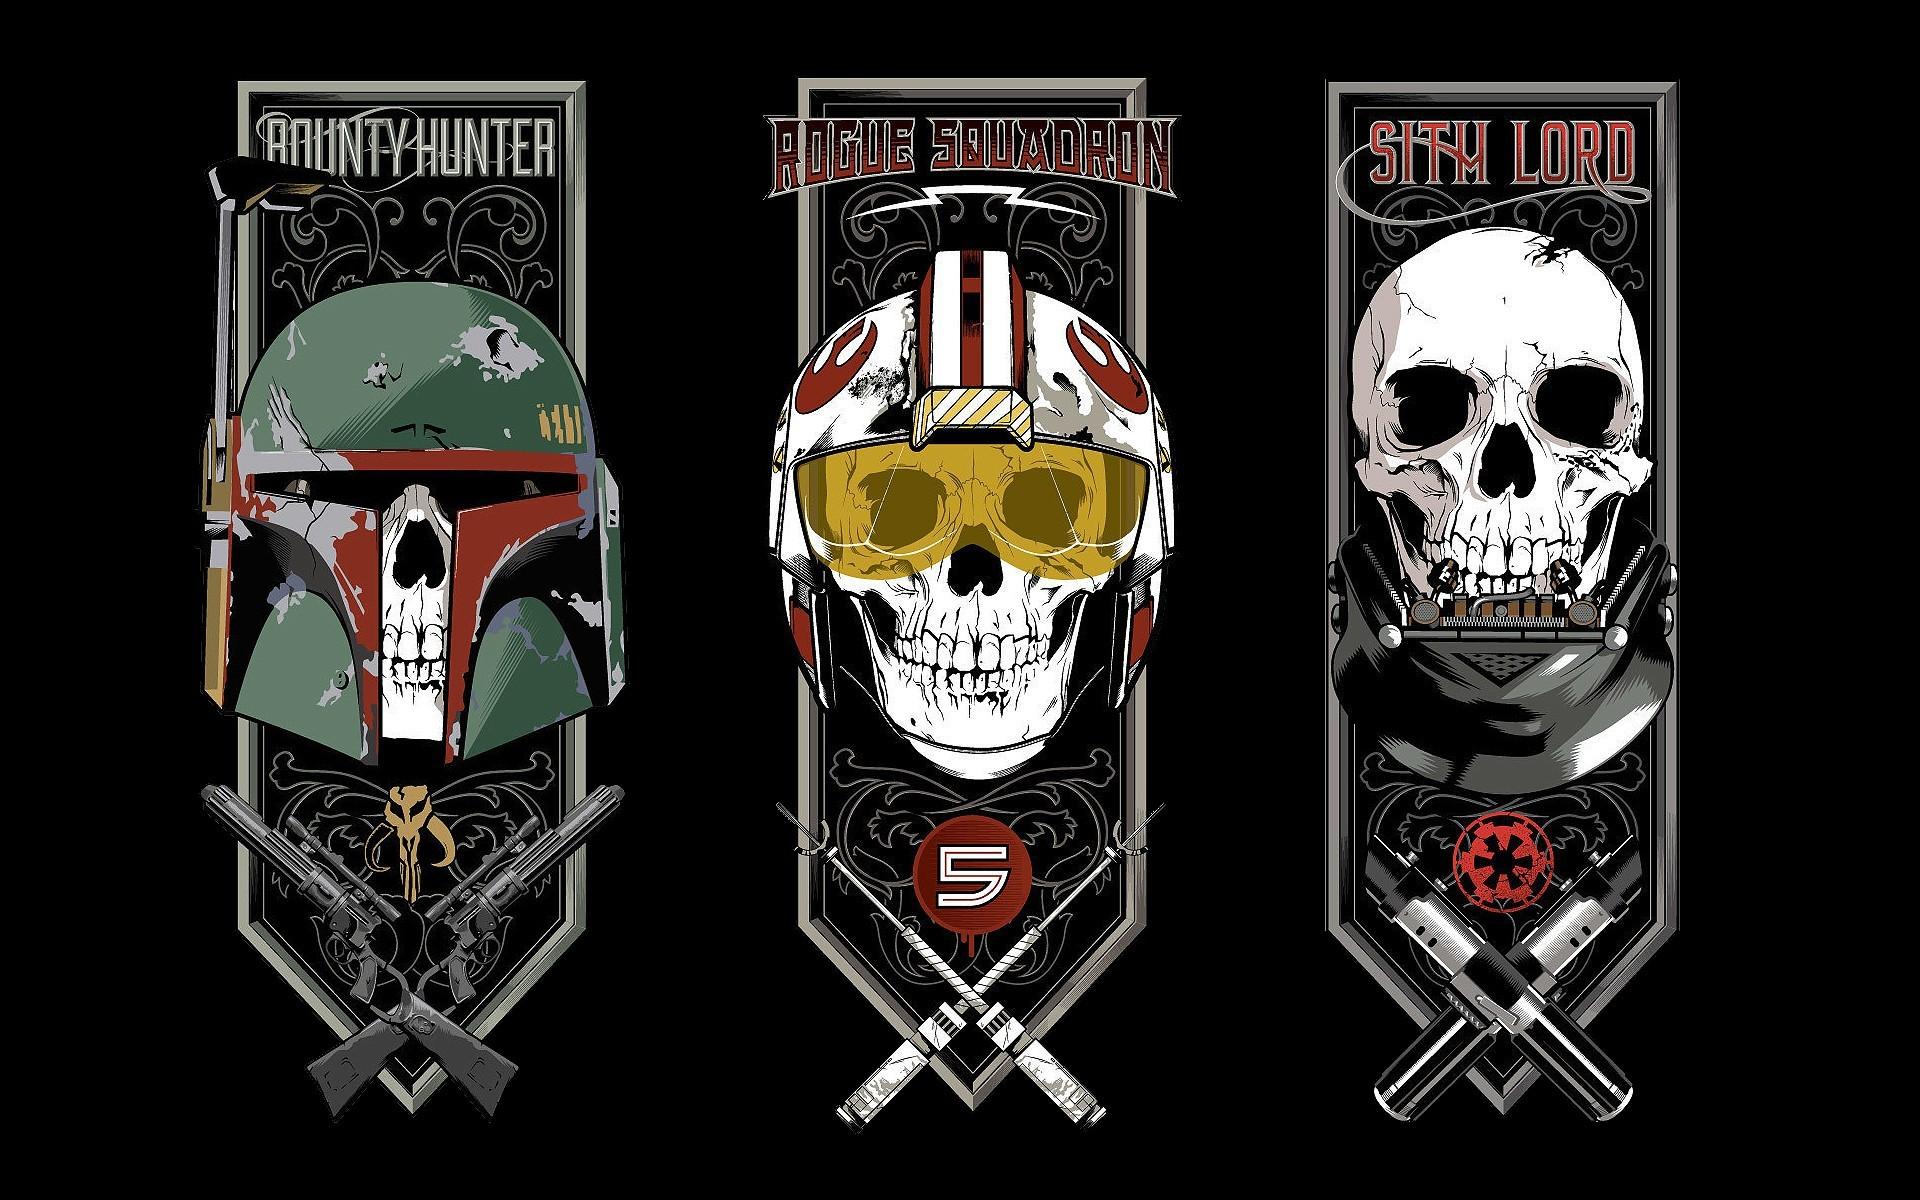 Star Wars Sith Wallpaper High Quality As Wallpaper HD